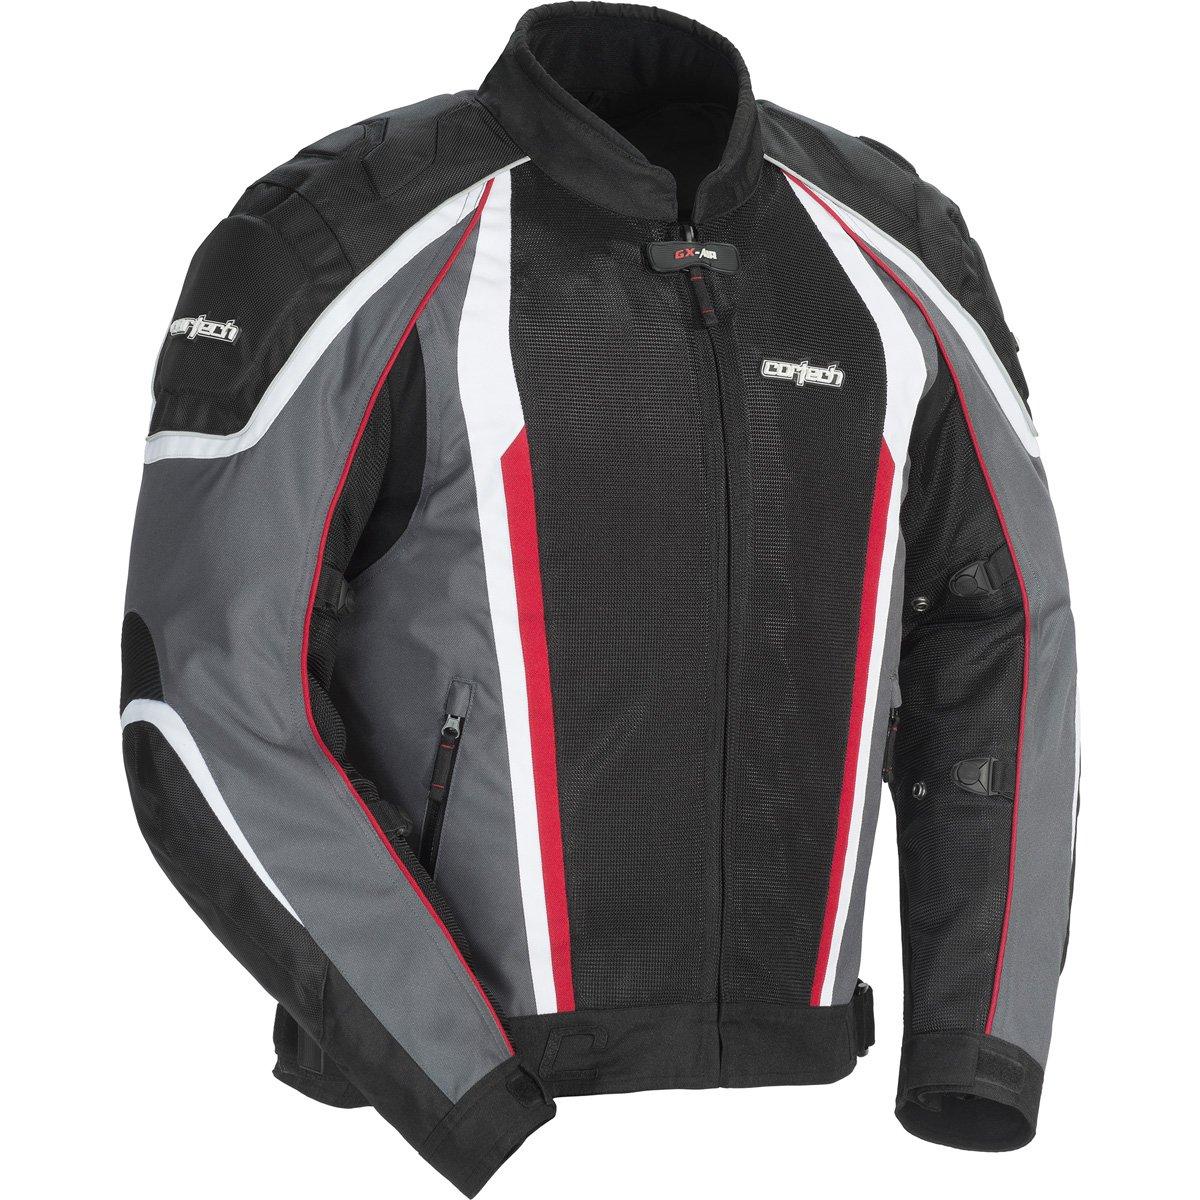 Cortech GX Sport Air 4.0 Adult Mesh Road Race Motorcycle Jacket - Gunmetal/Black / X-Large